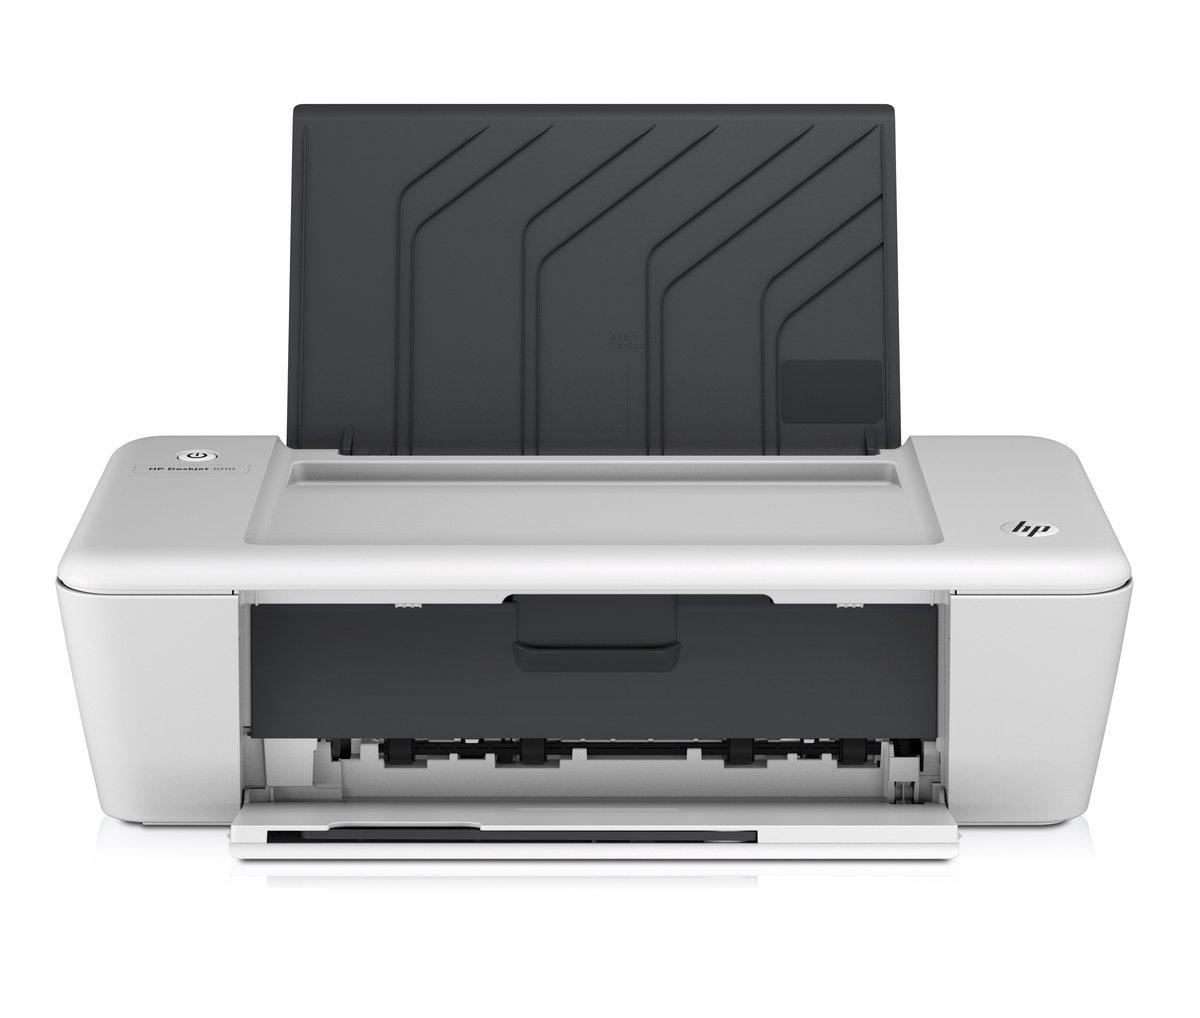 HP Deskjet 1010 Inkjet Printer Color 600 x 600 dpi Print Plain ...